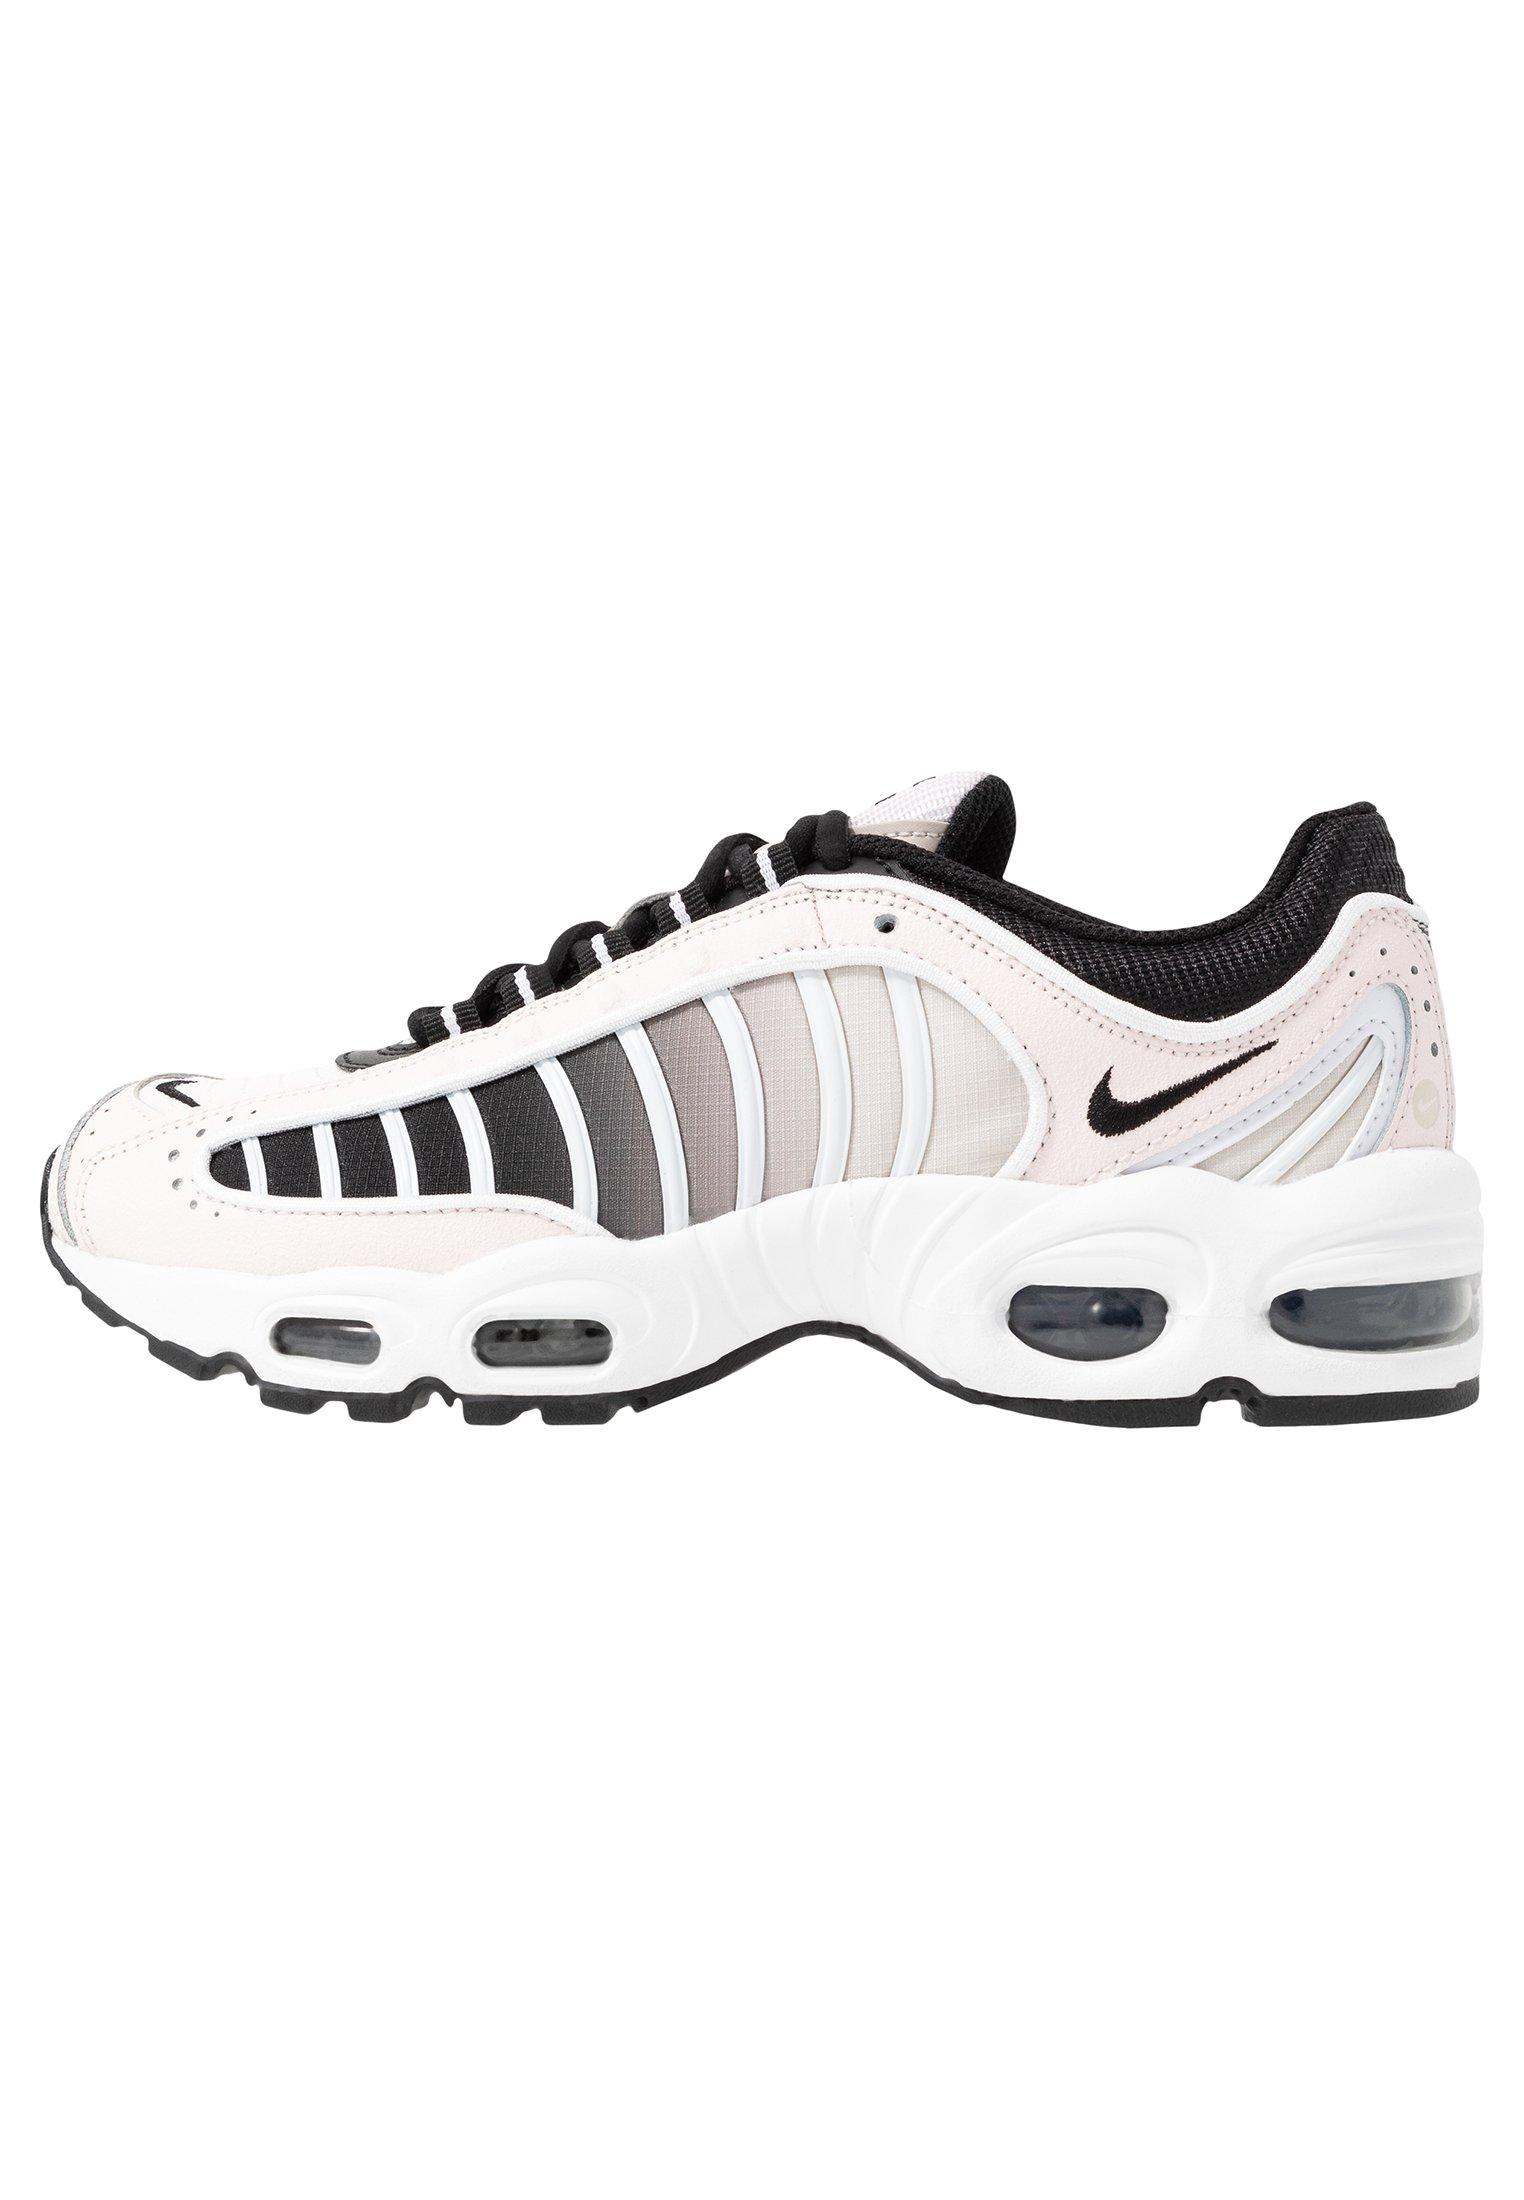 AIR MAX TAILWIND Sneakers light soft pinkblackwhitedesert sand